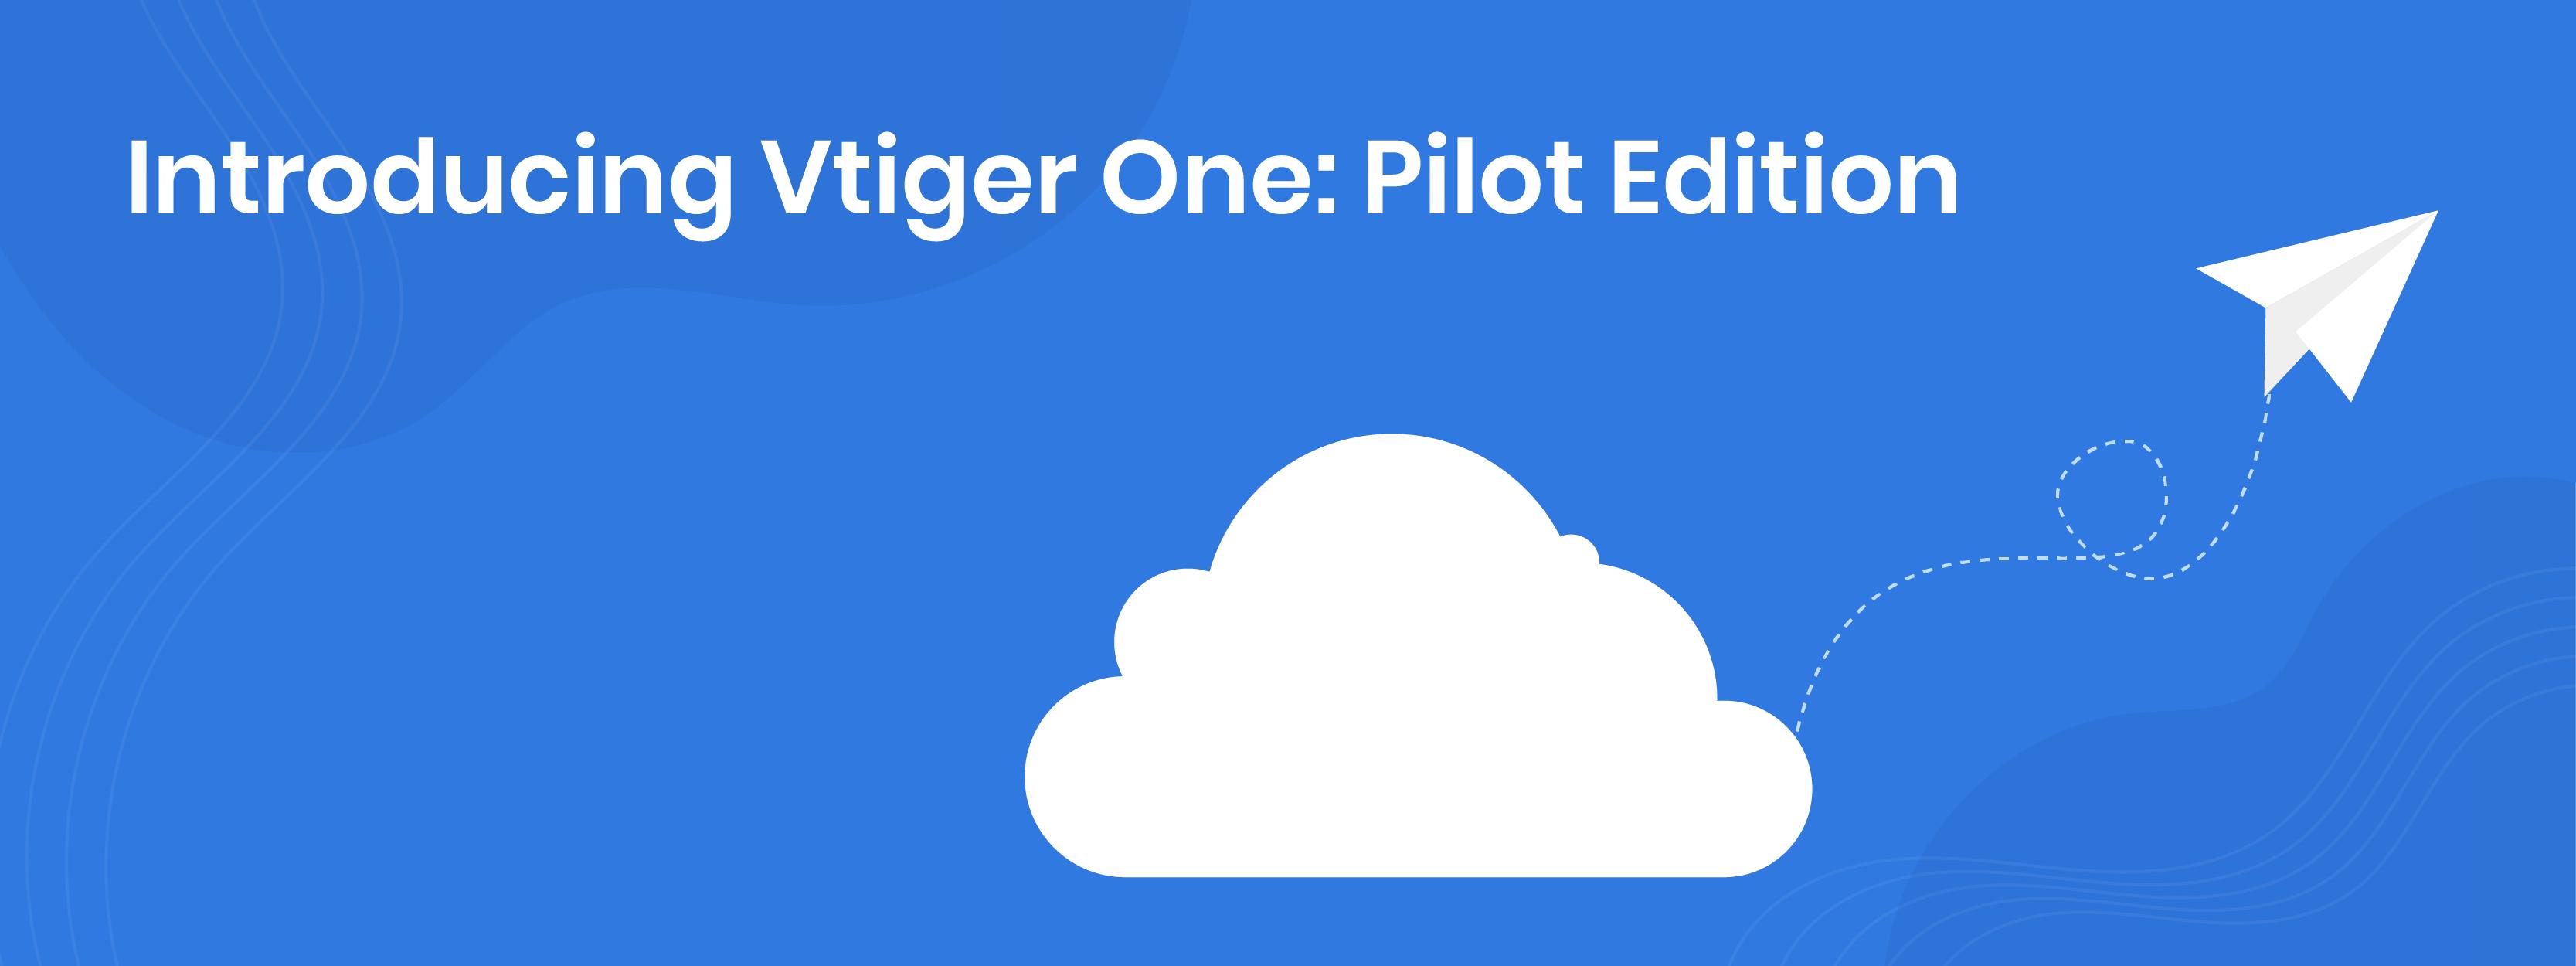 Pilot Edition Image